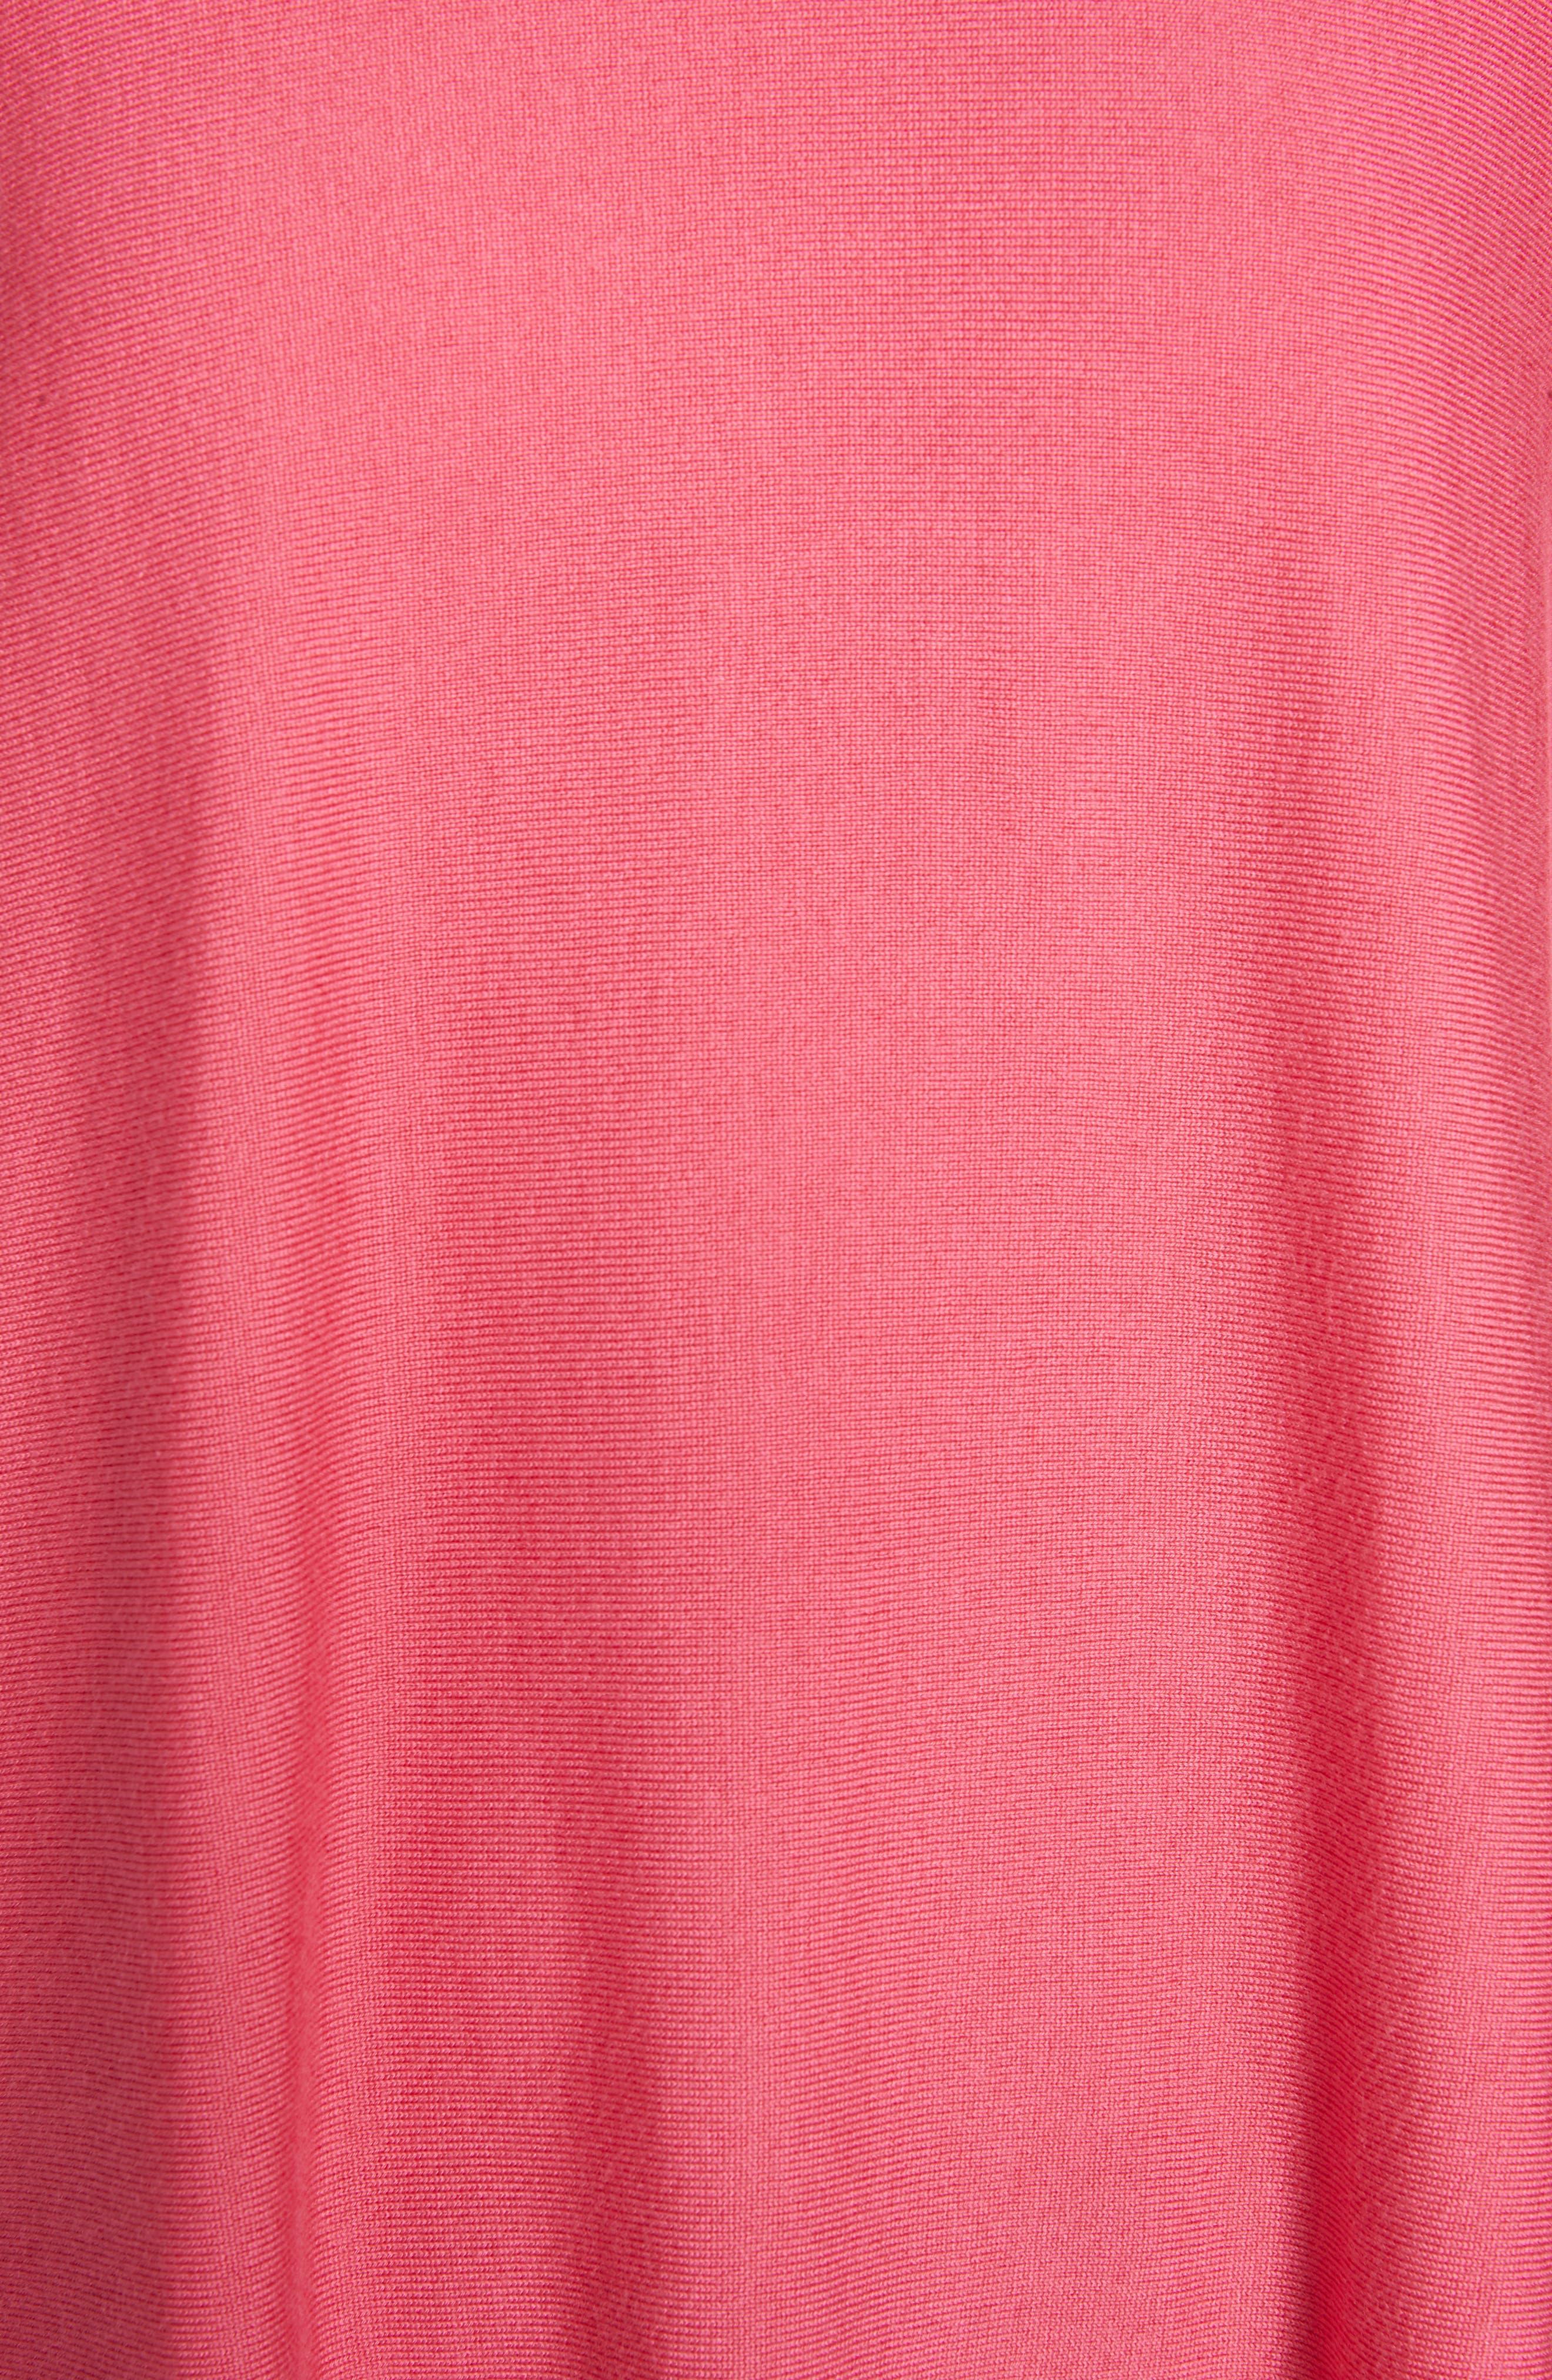 Tencel<sup>®</sup> Lyocell Blend Sweater,                             Alternate thumbnail 5, color,                             CHERRY LANE